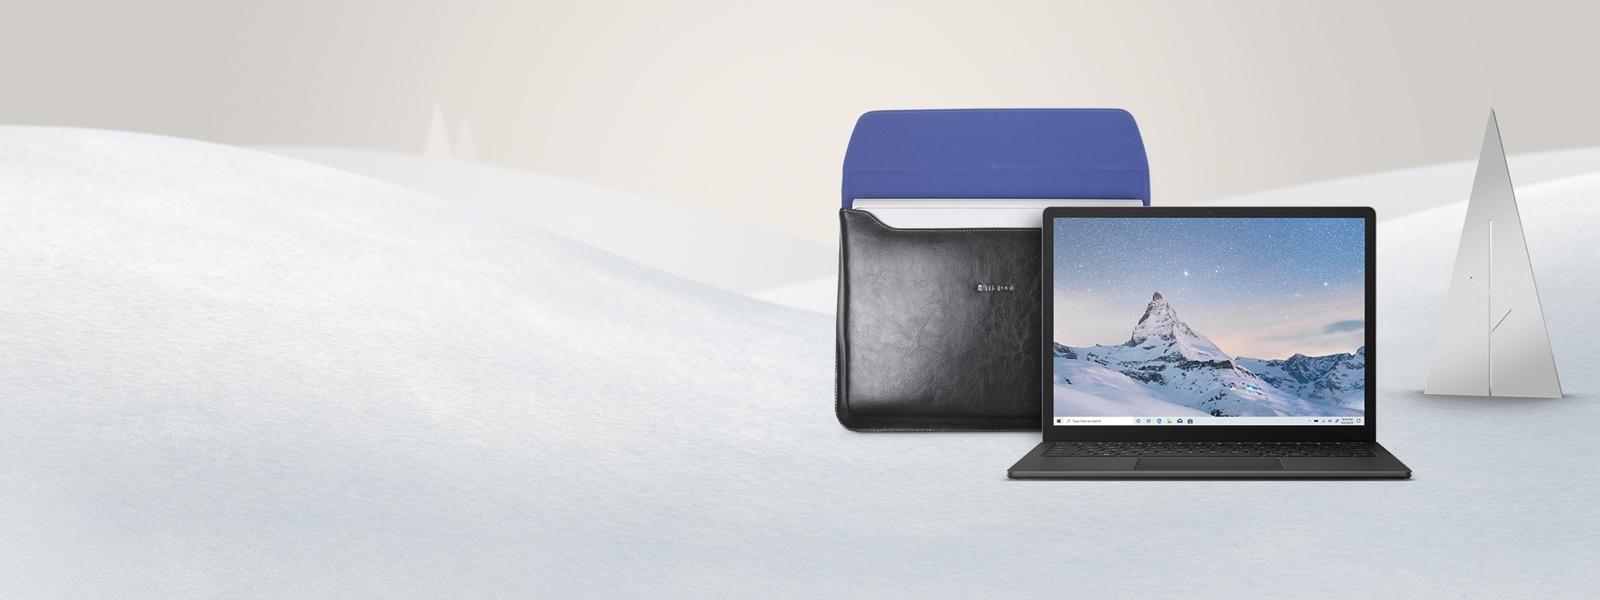 Surface Laptop 3 (Black) and Maroo Black Leather Sleeve